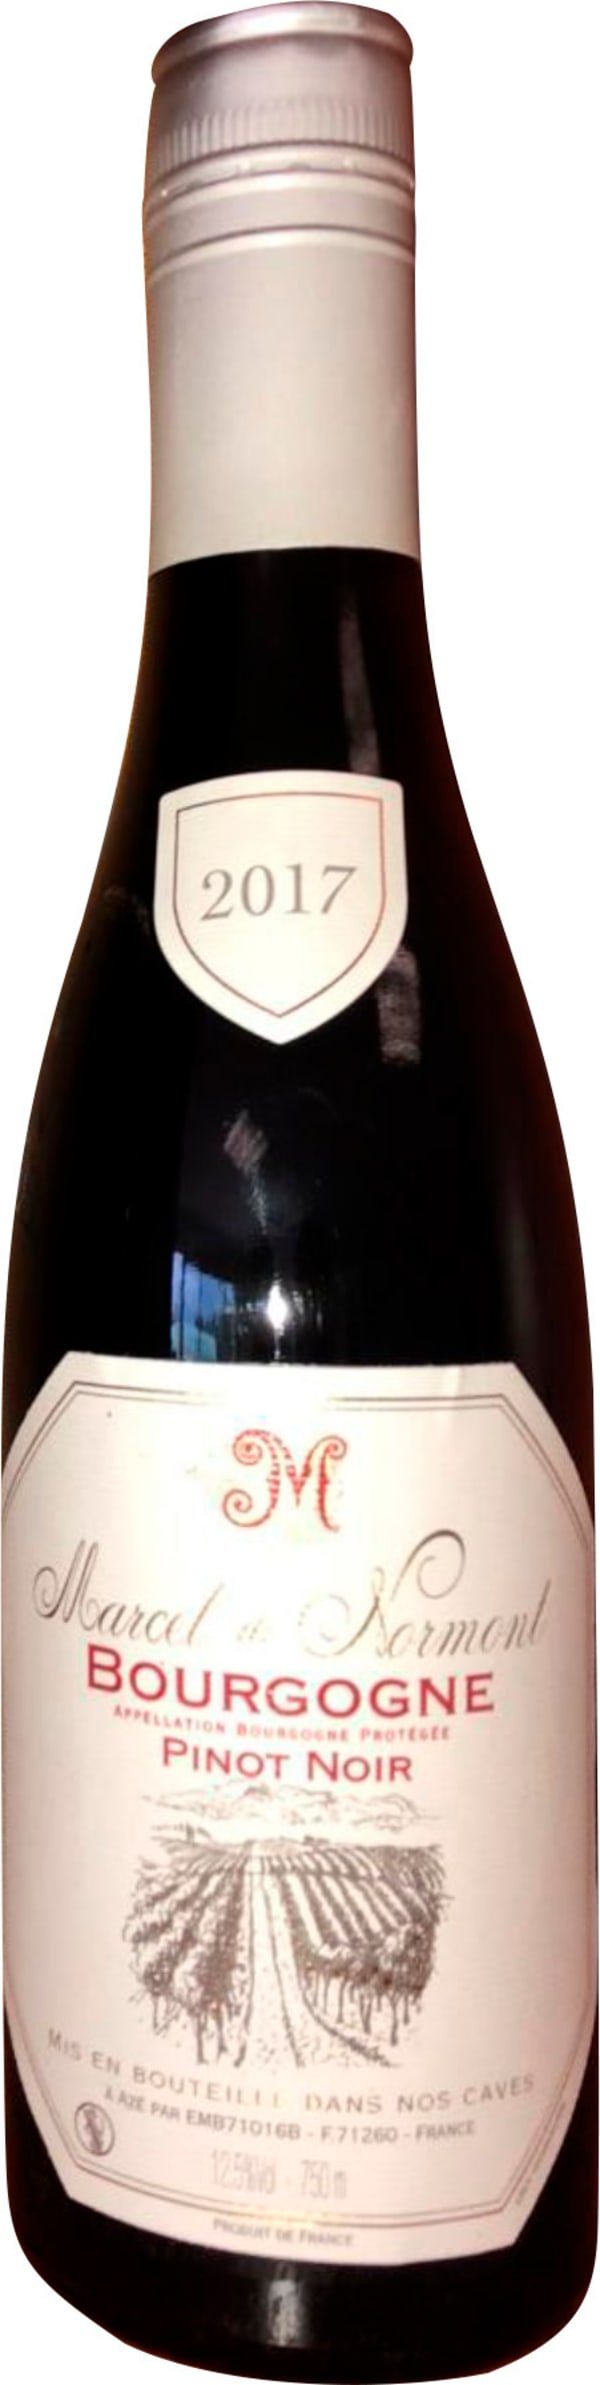 Marcel de Normont Bourgogne Pinot Noir 2017